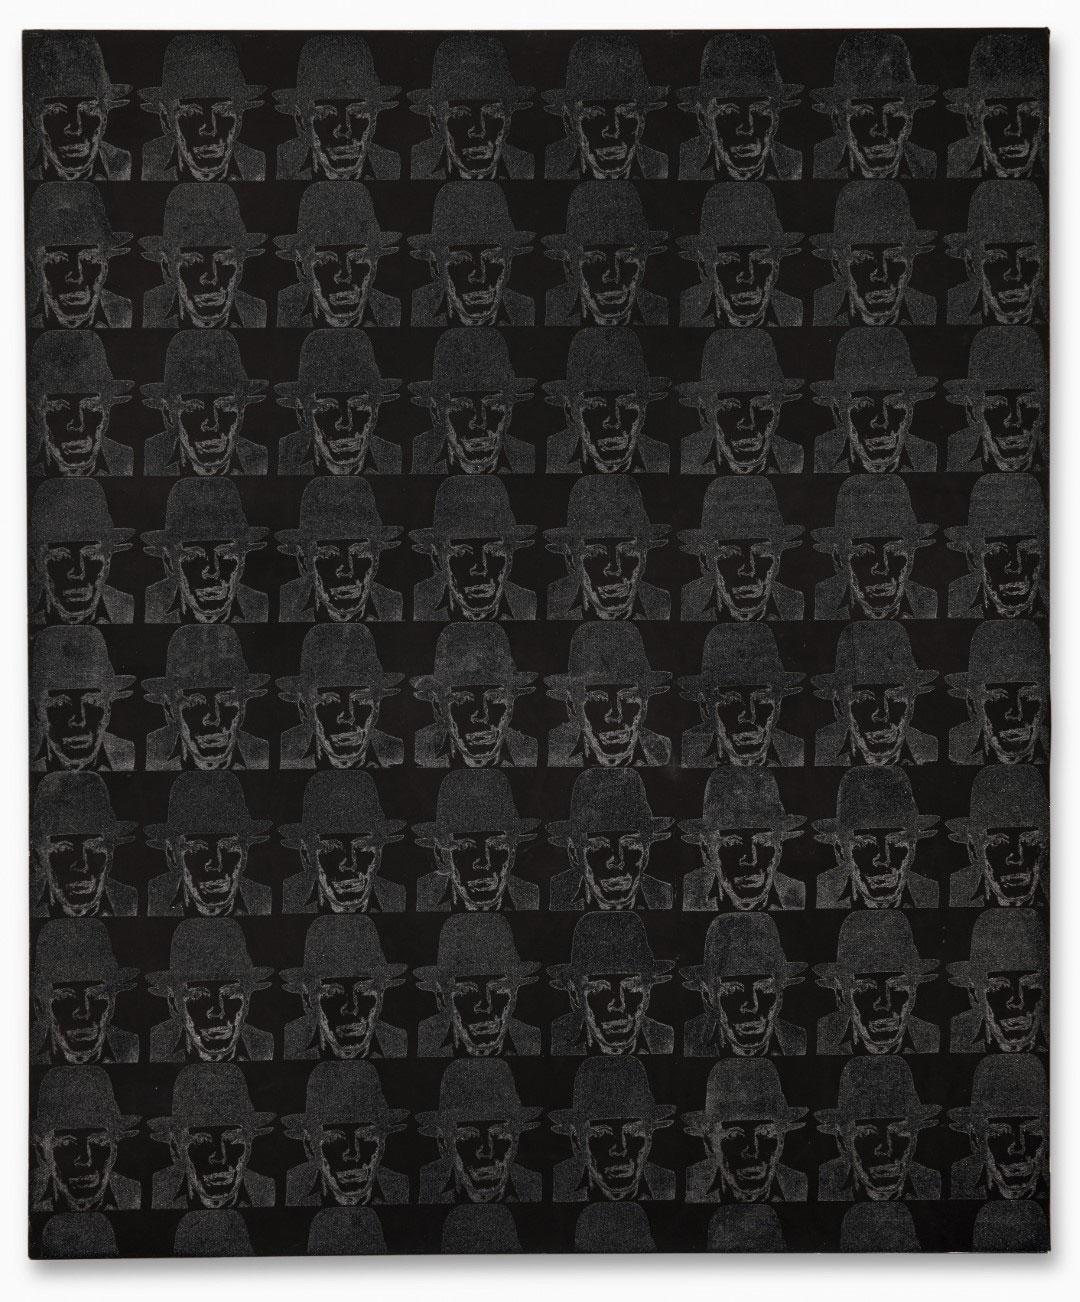 Lot-134,-Andy-Warhol,-Joseph-Beuys-(Reversal),-1983,-est.jpg